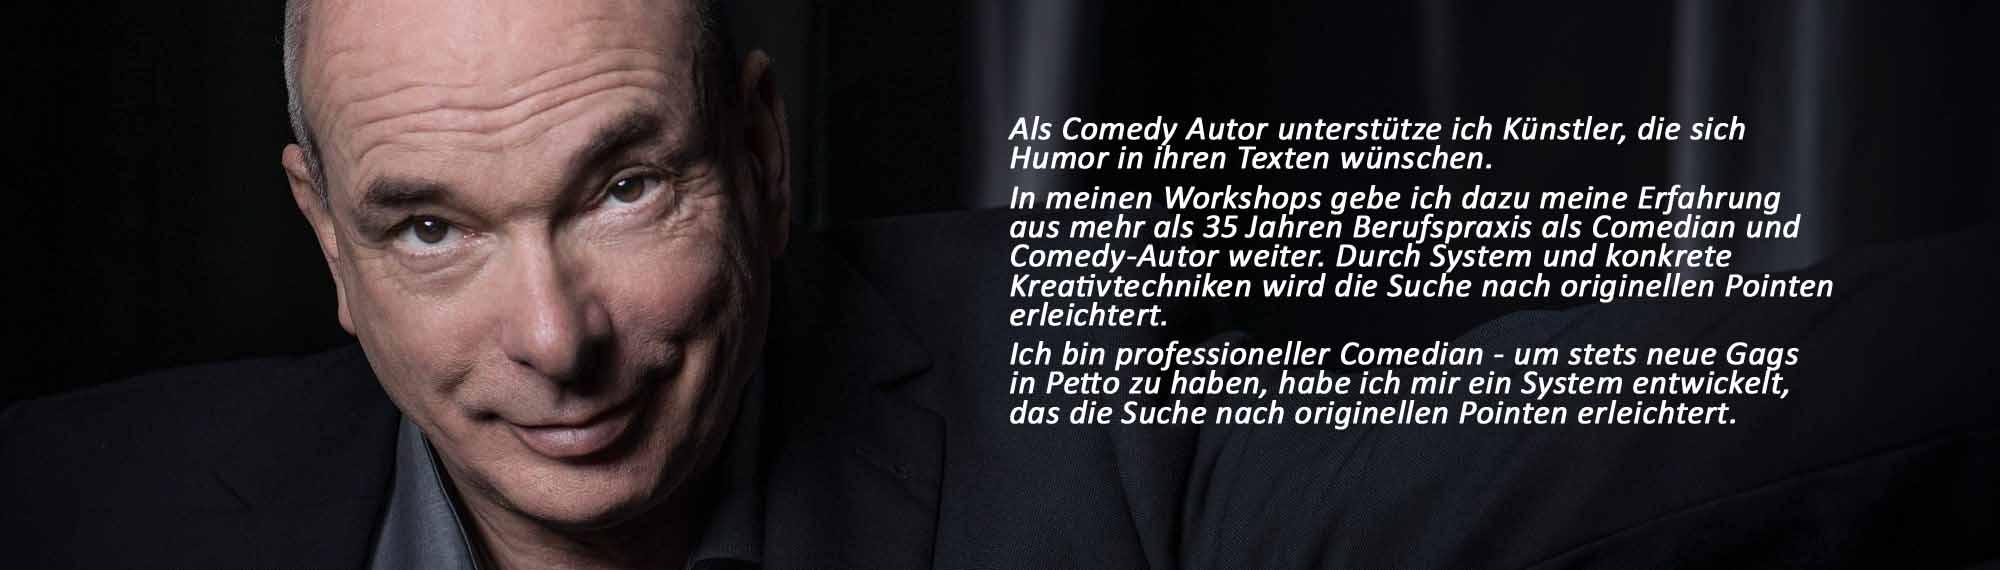 Banner_Michael-Genaehr_capital-comediy.de_vita